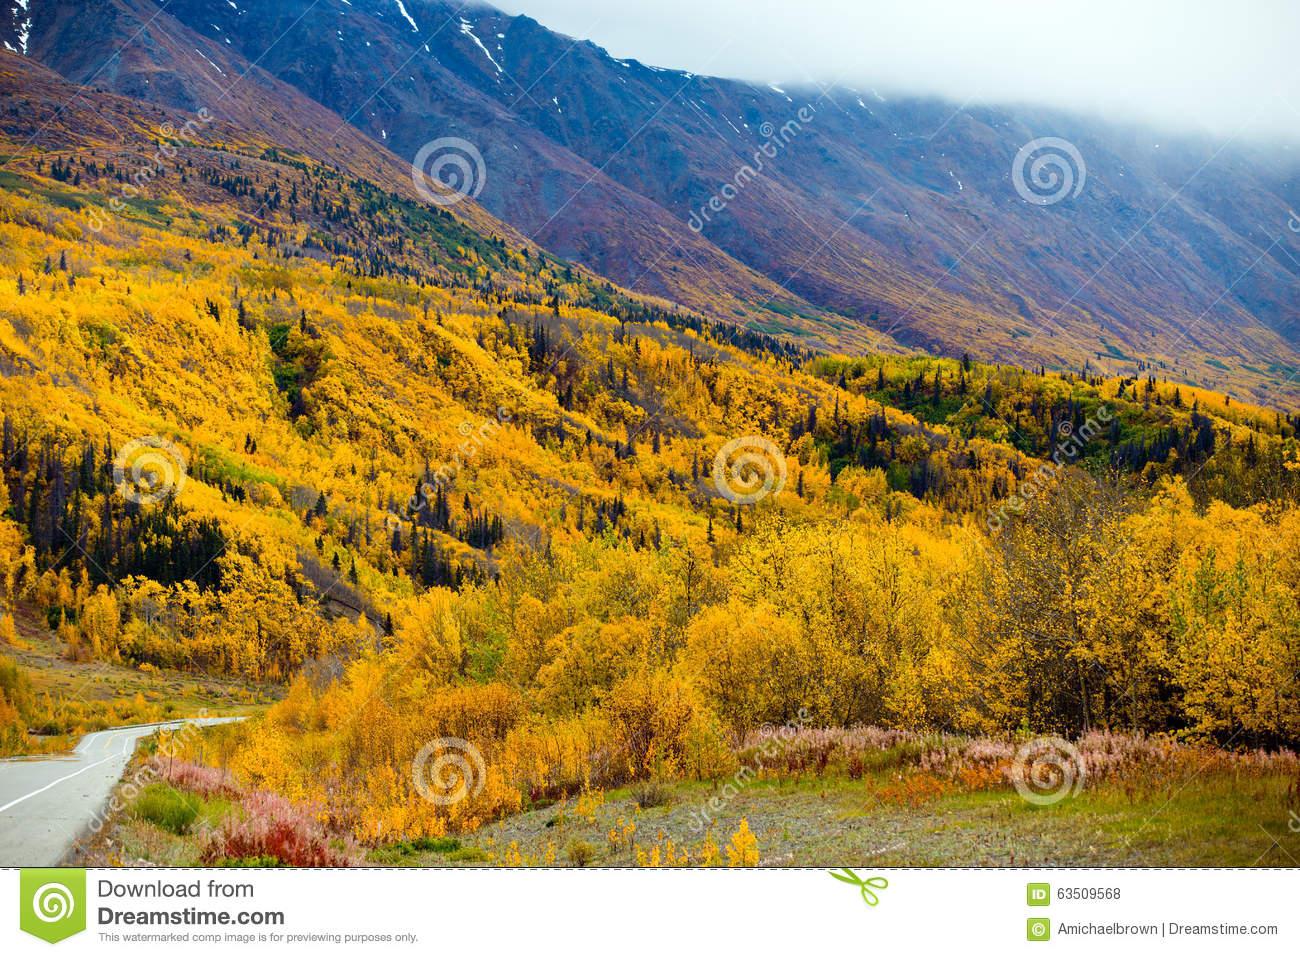 Alaska Highway From Haines Junction, Yukon Territories To Haines.